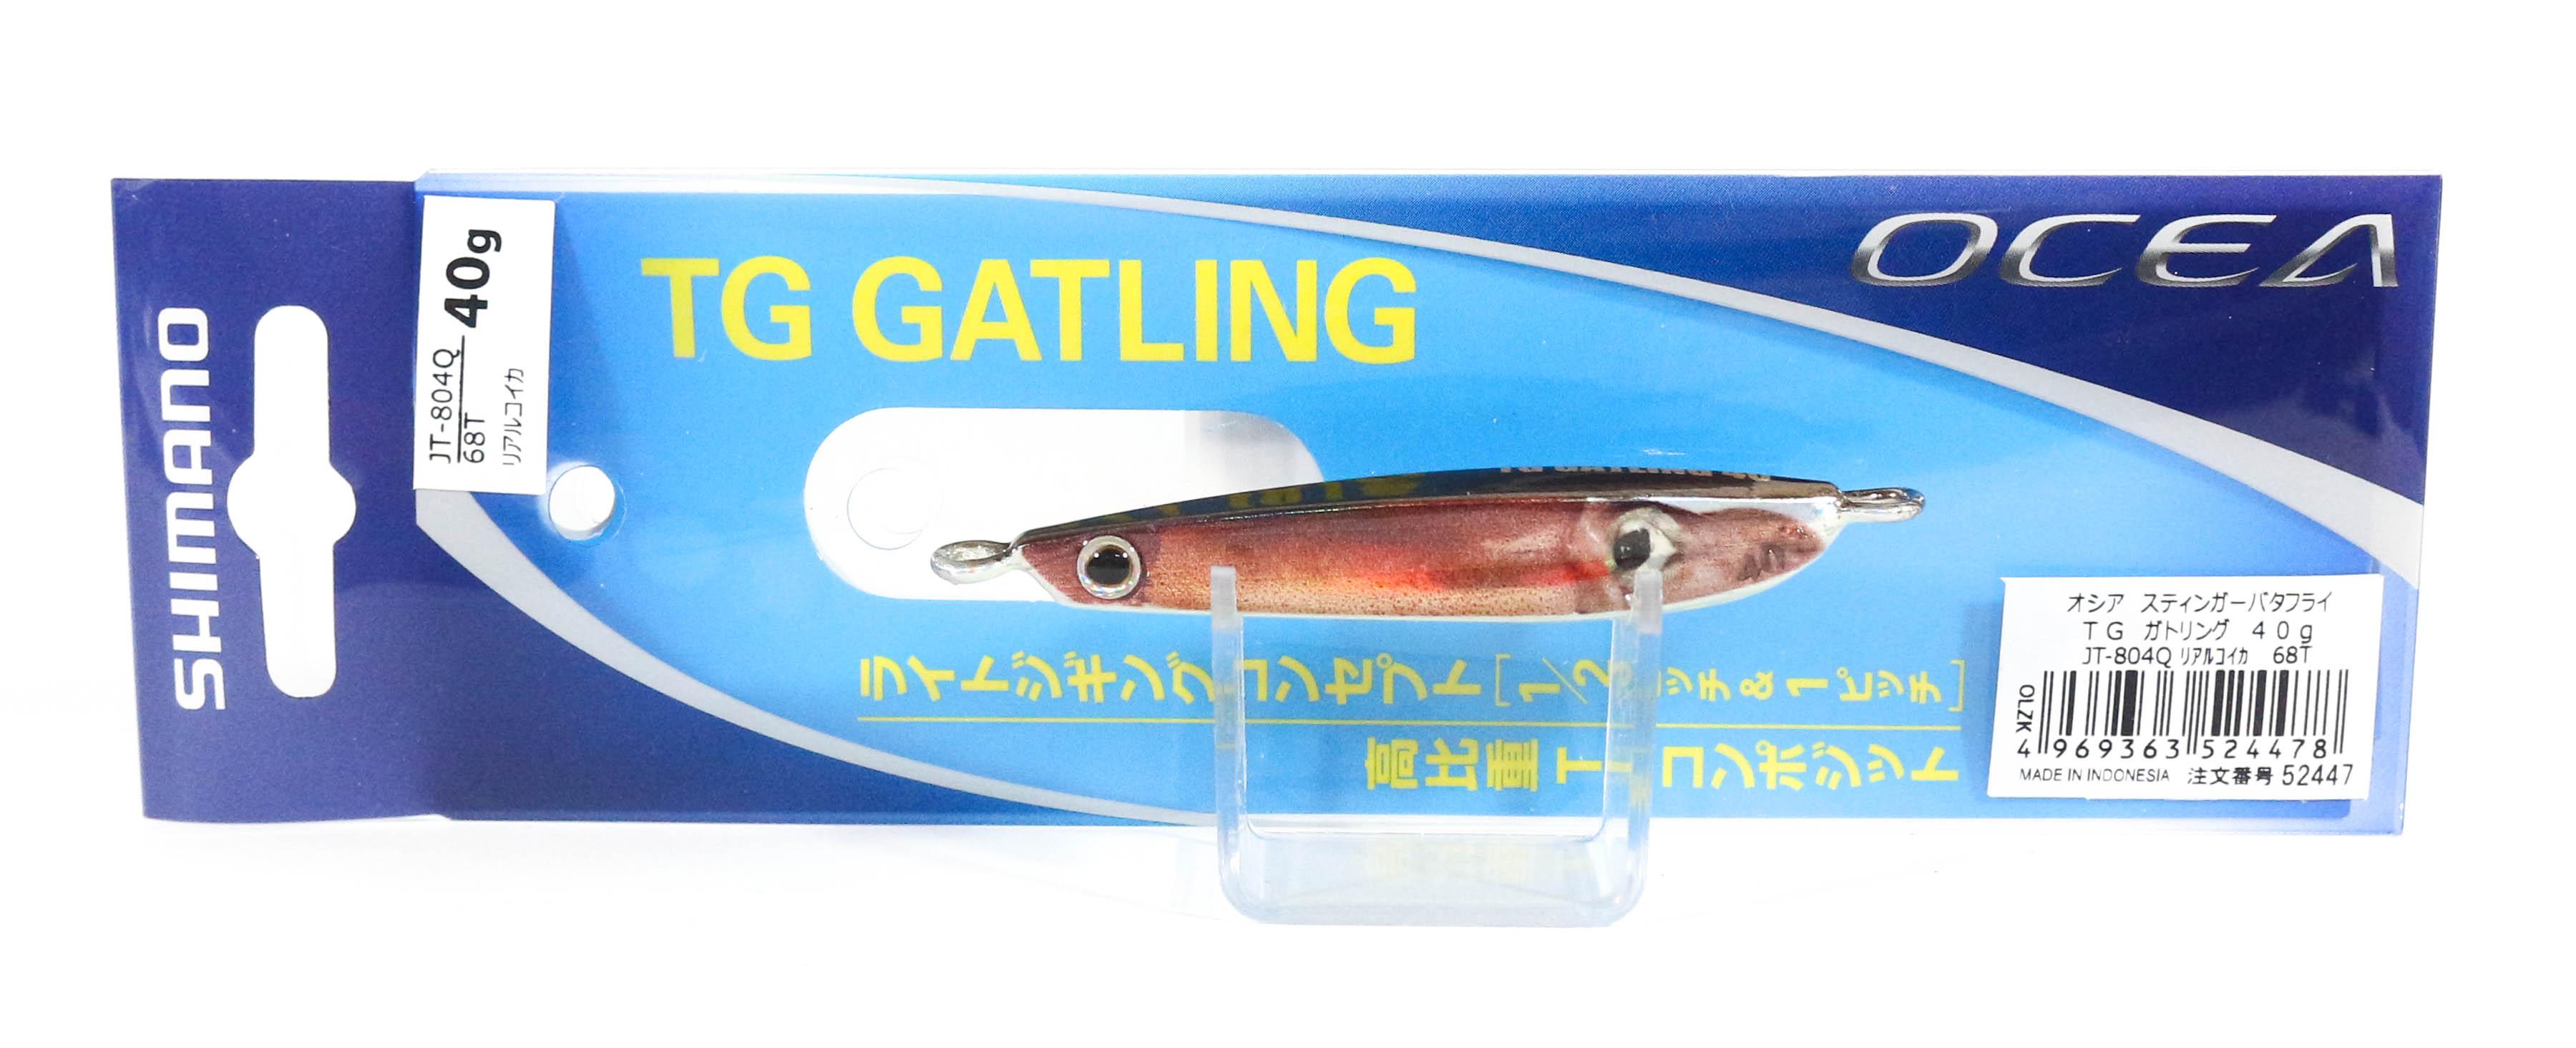 Shimano JT-804Q Metal Jig TG Gatling 40 grams 68T 524478